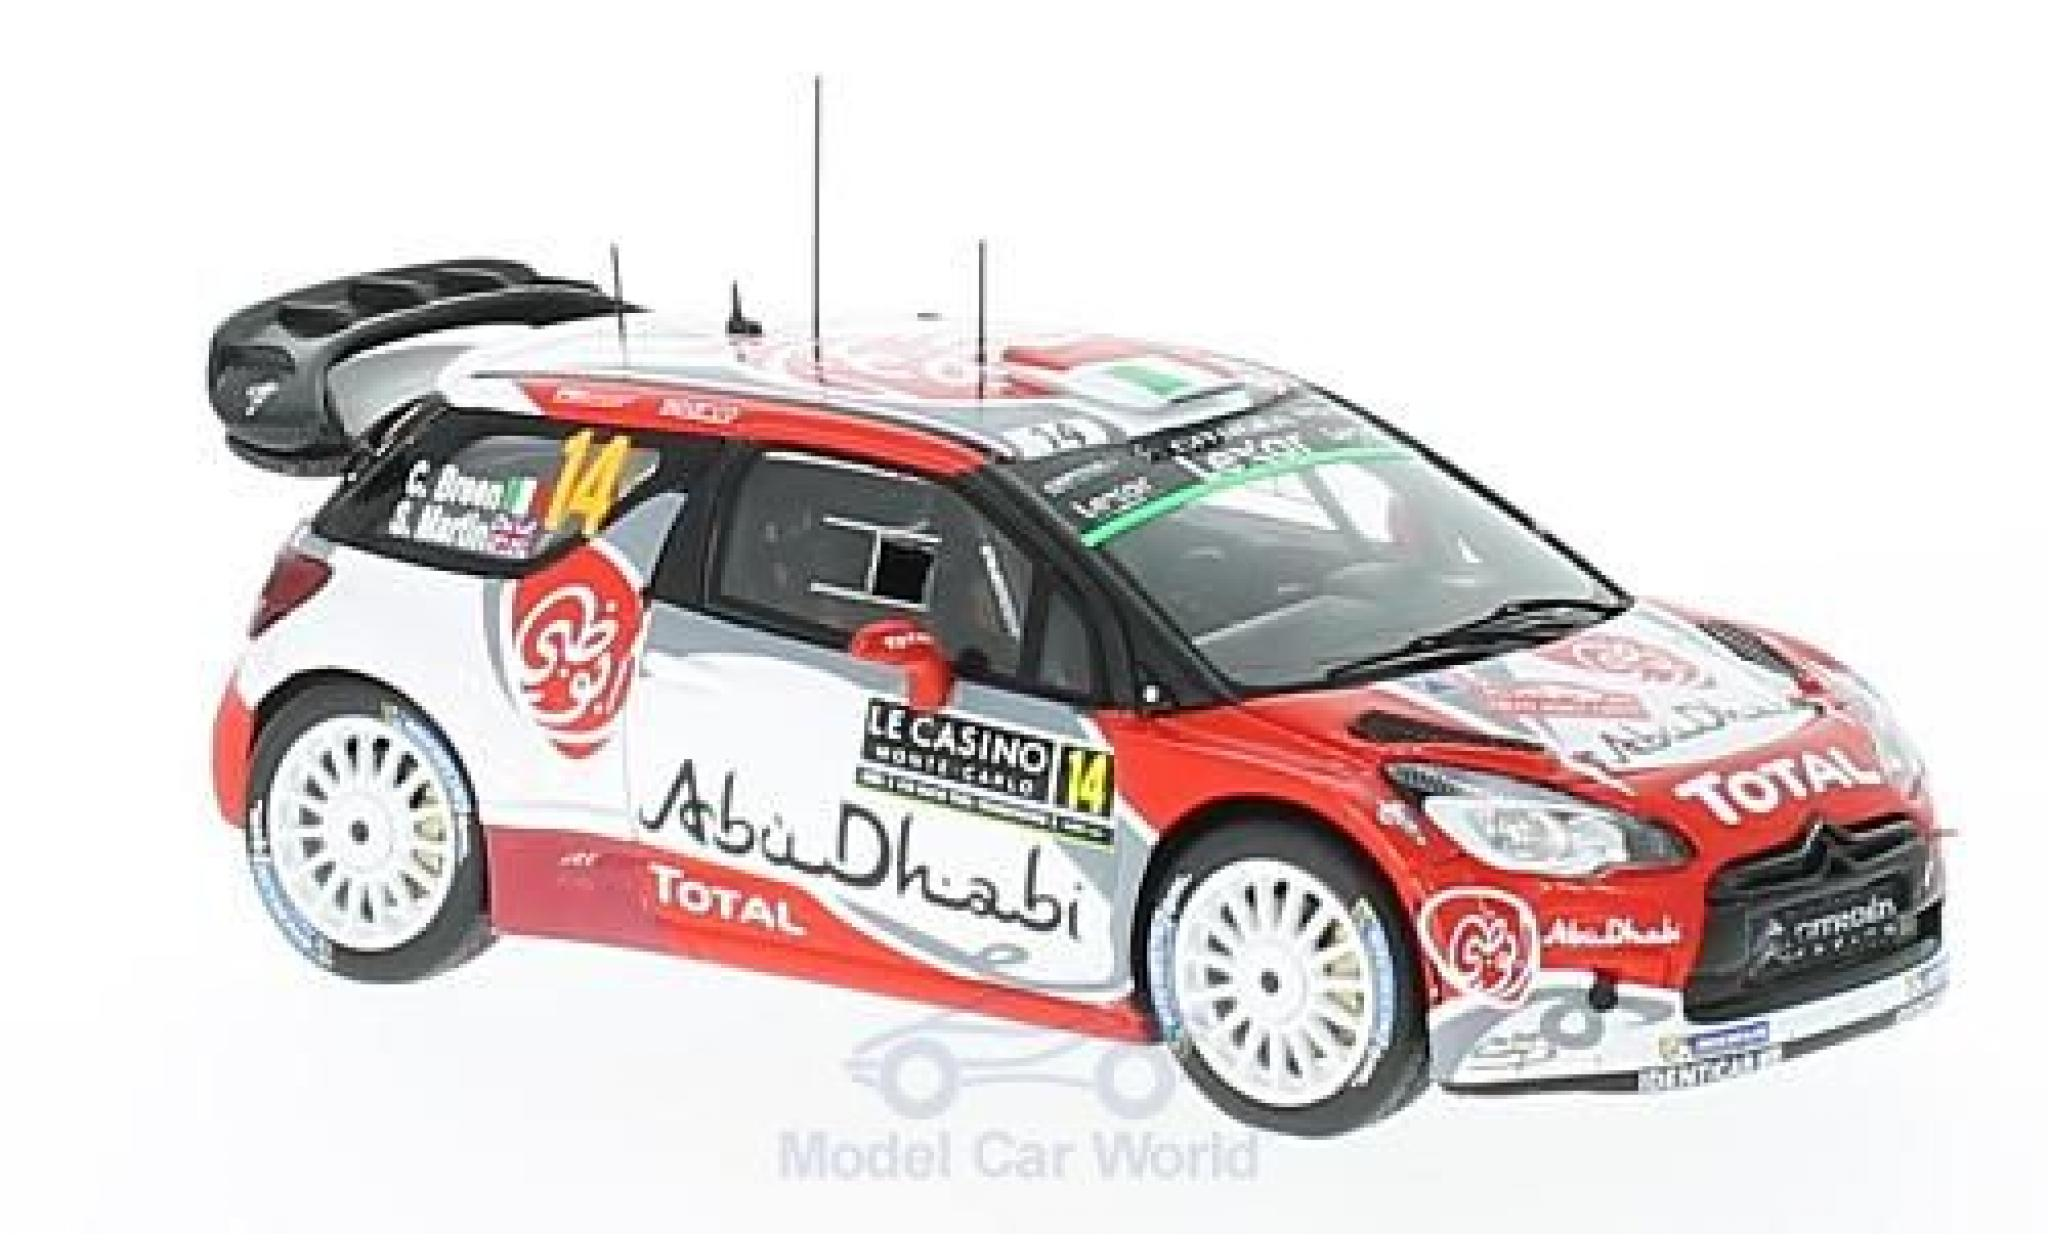 DS Automobiles DS3 1/43 Spark Citroen WRC No.14 Citroen Total Abu Dhabi WRT WRC Rallye Monte Carlo 2017 C.Breen/S.Martin